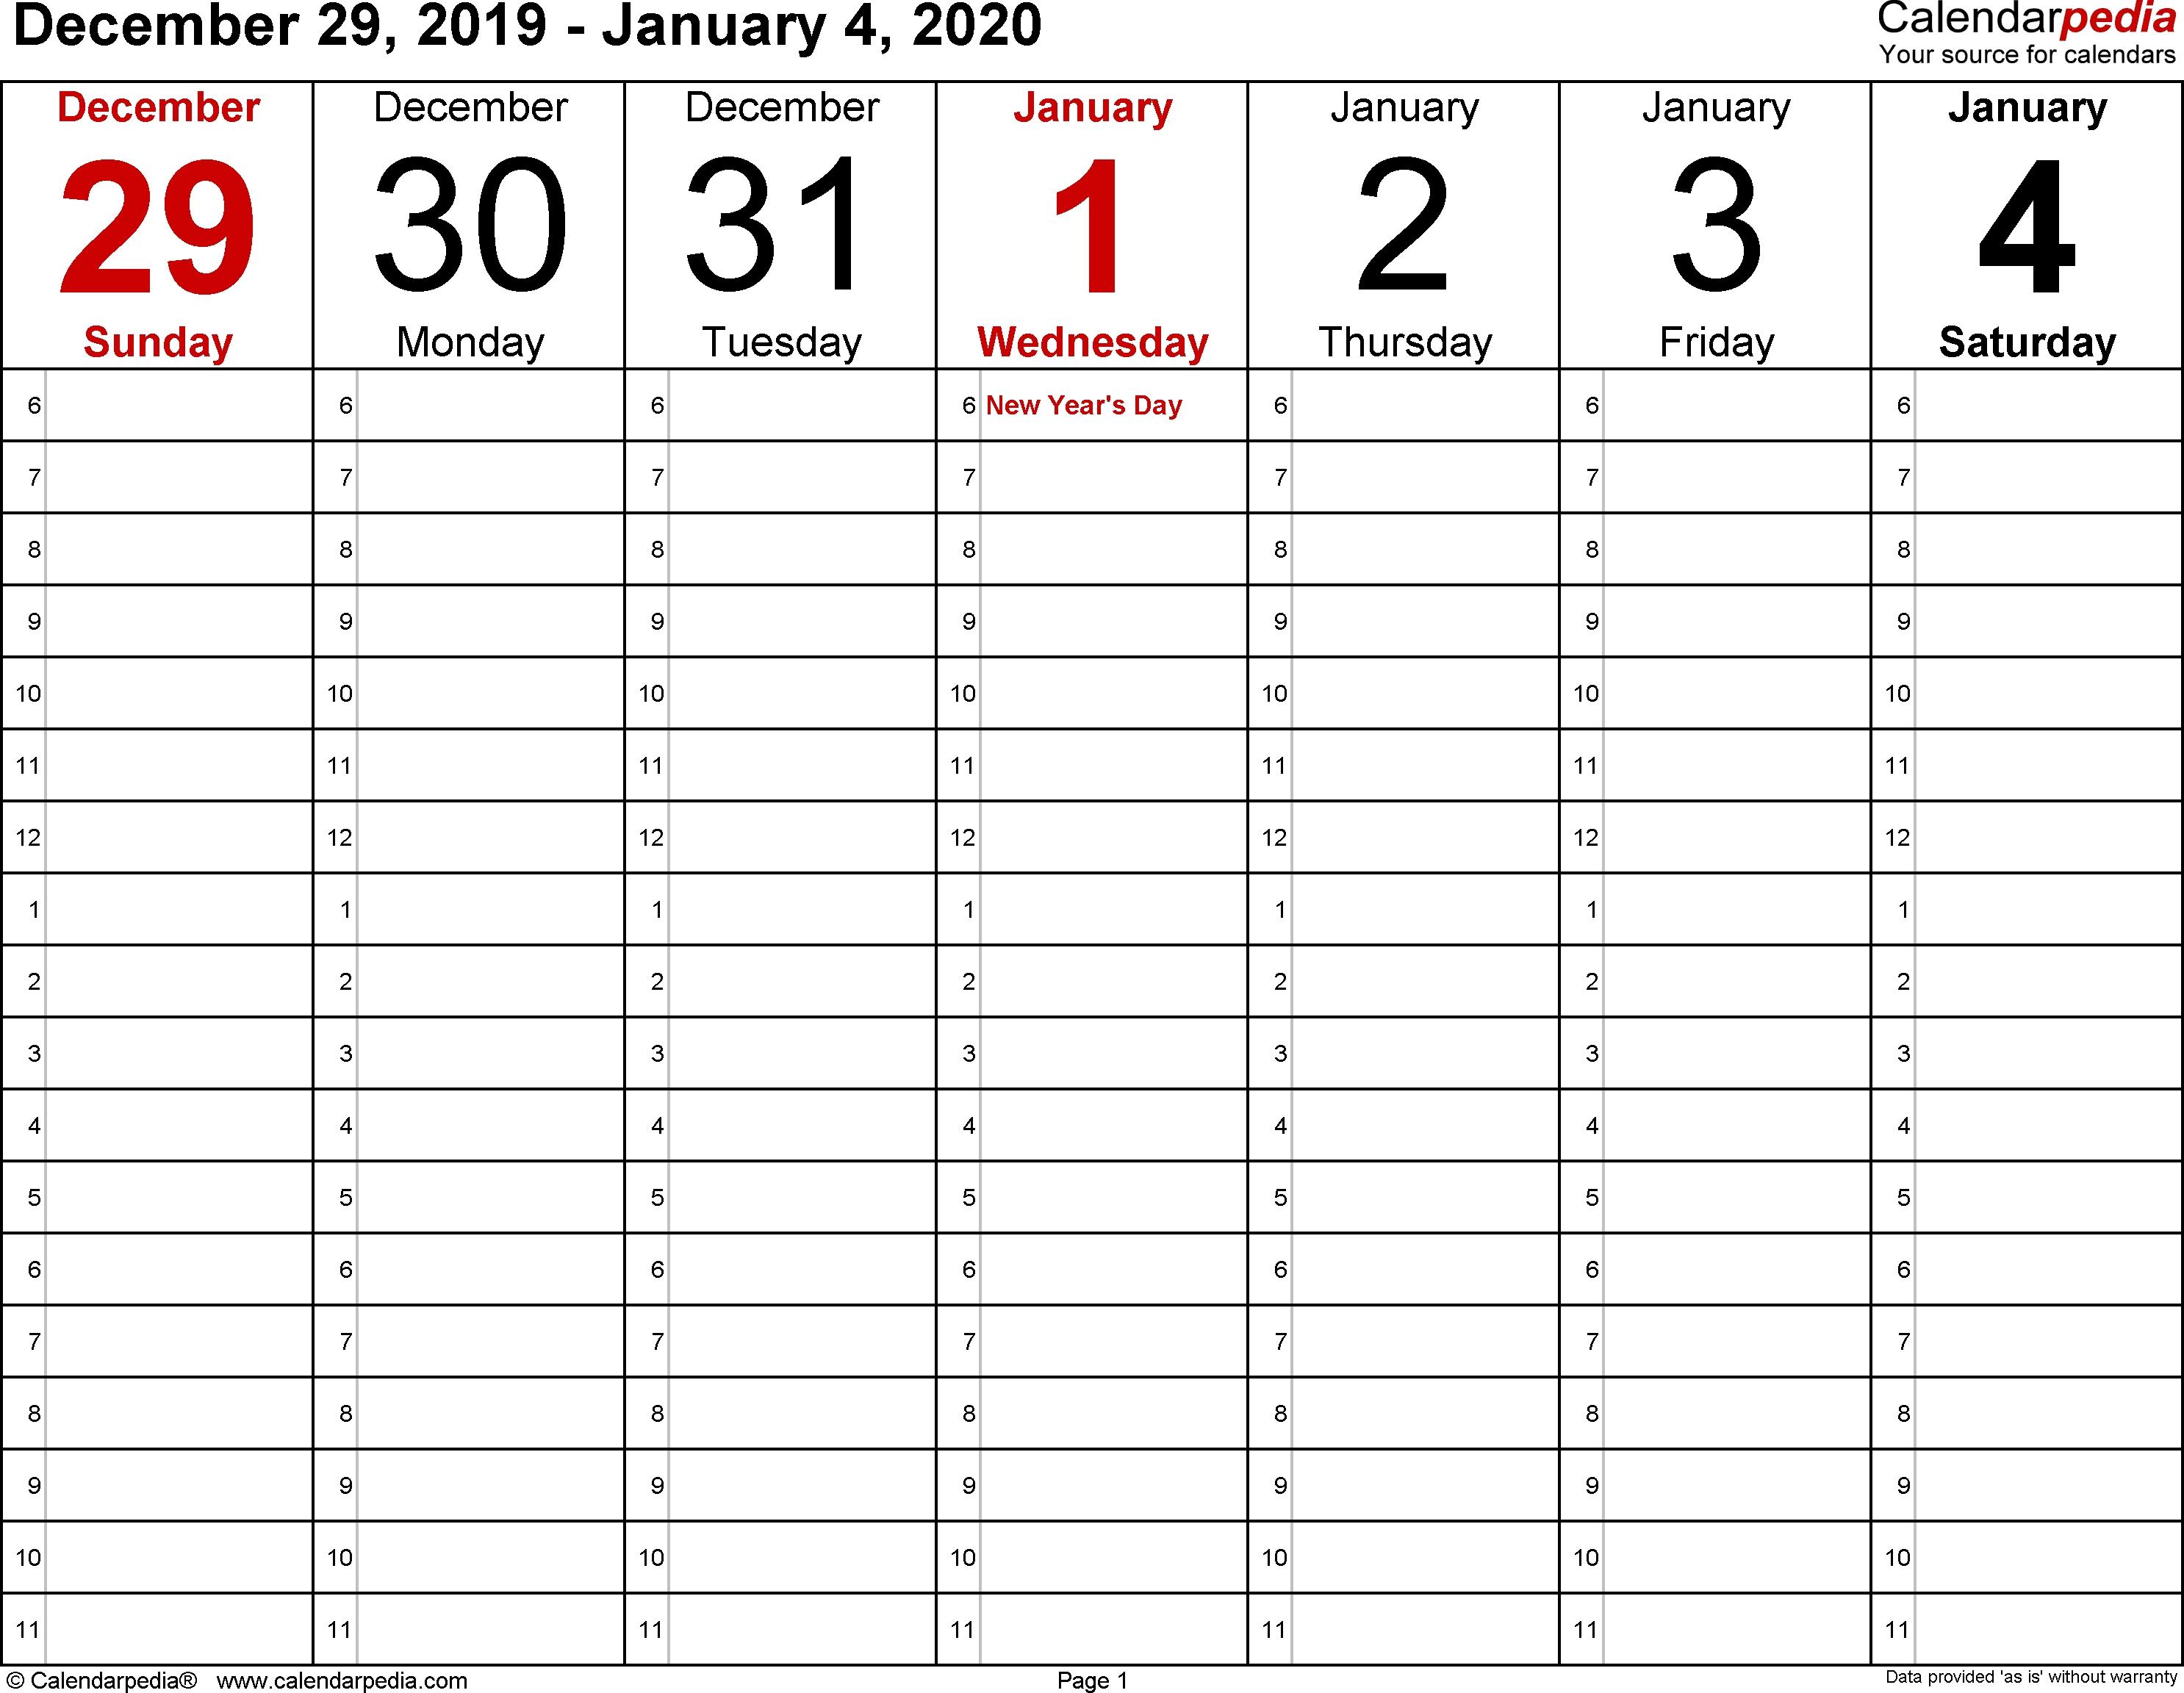 Weekly Calendar 2020 For Word - 12 Free Printable Templates pertaining to 2020 Printable Calendar 8.5 X 11 Free